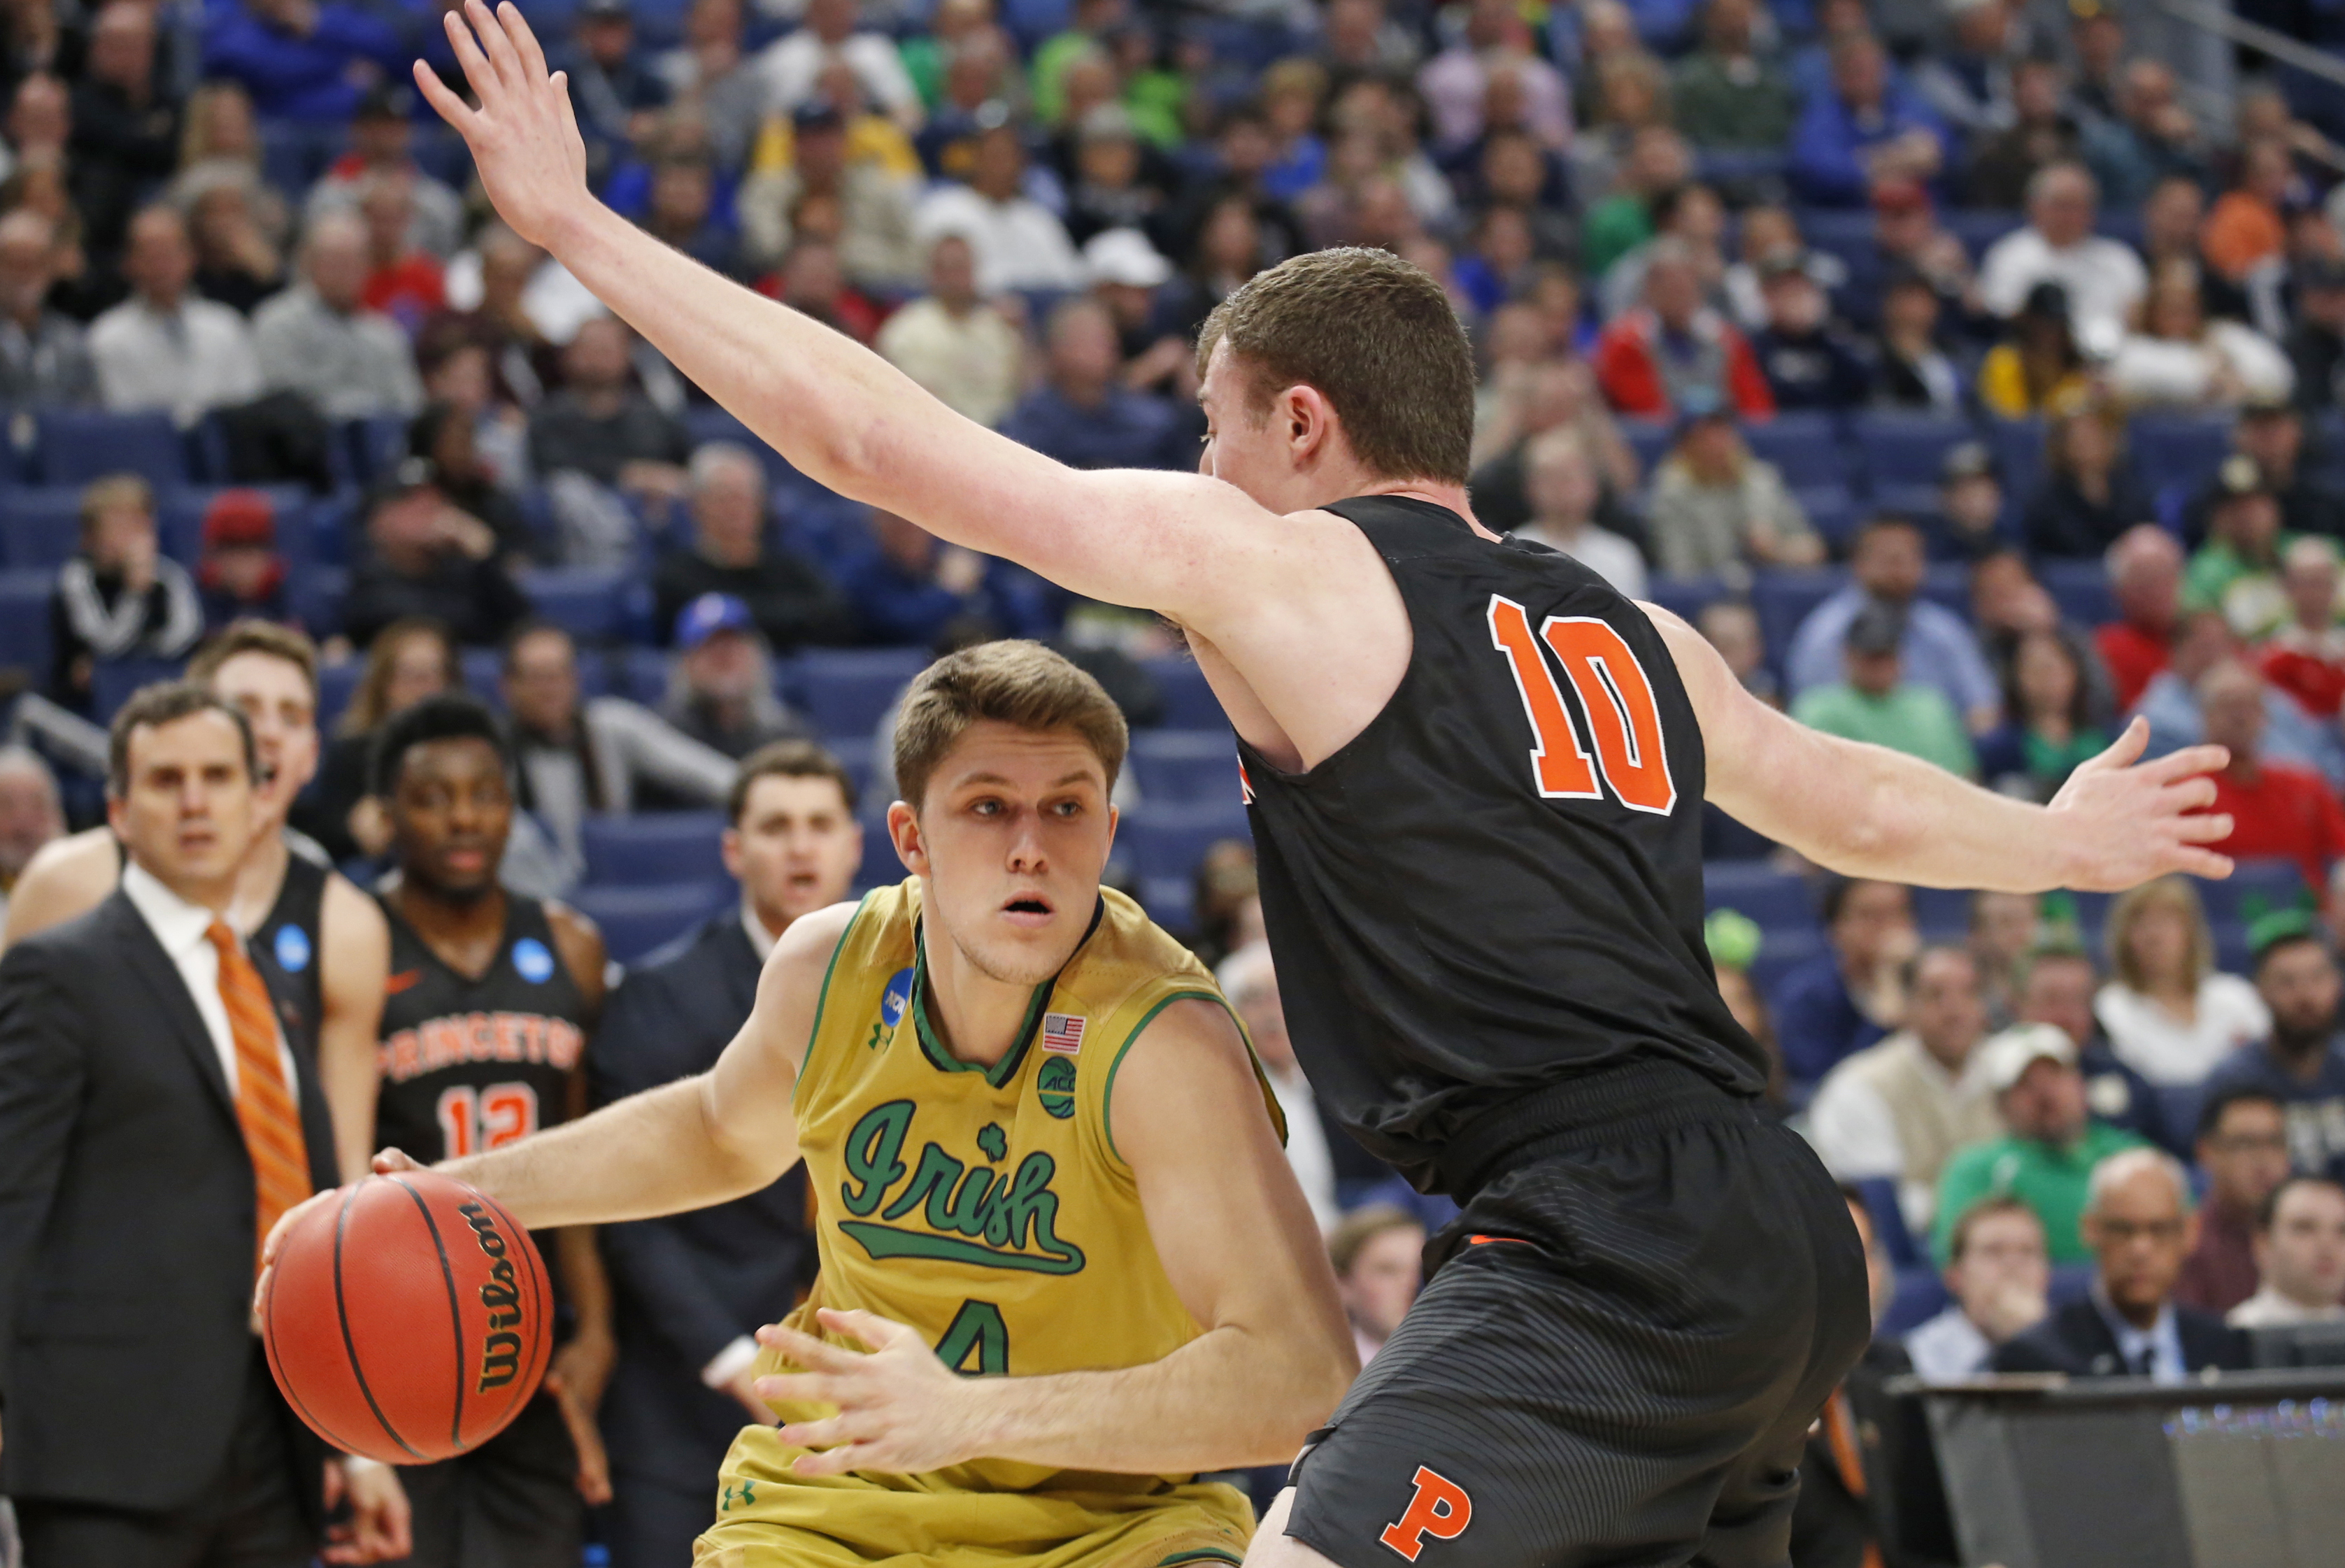 Notre Dame's Matt Ryan decides to go low beneath Princeton's Spencer Welsz. (Robert Kirkham/Buffalo News)